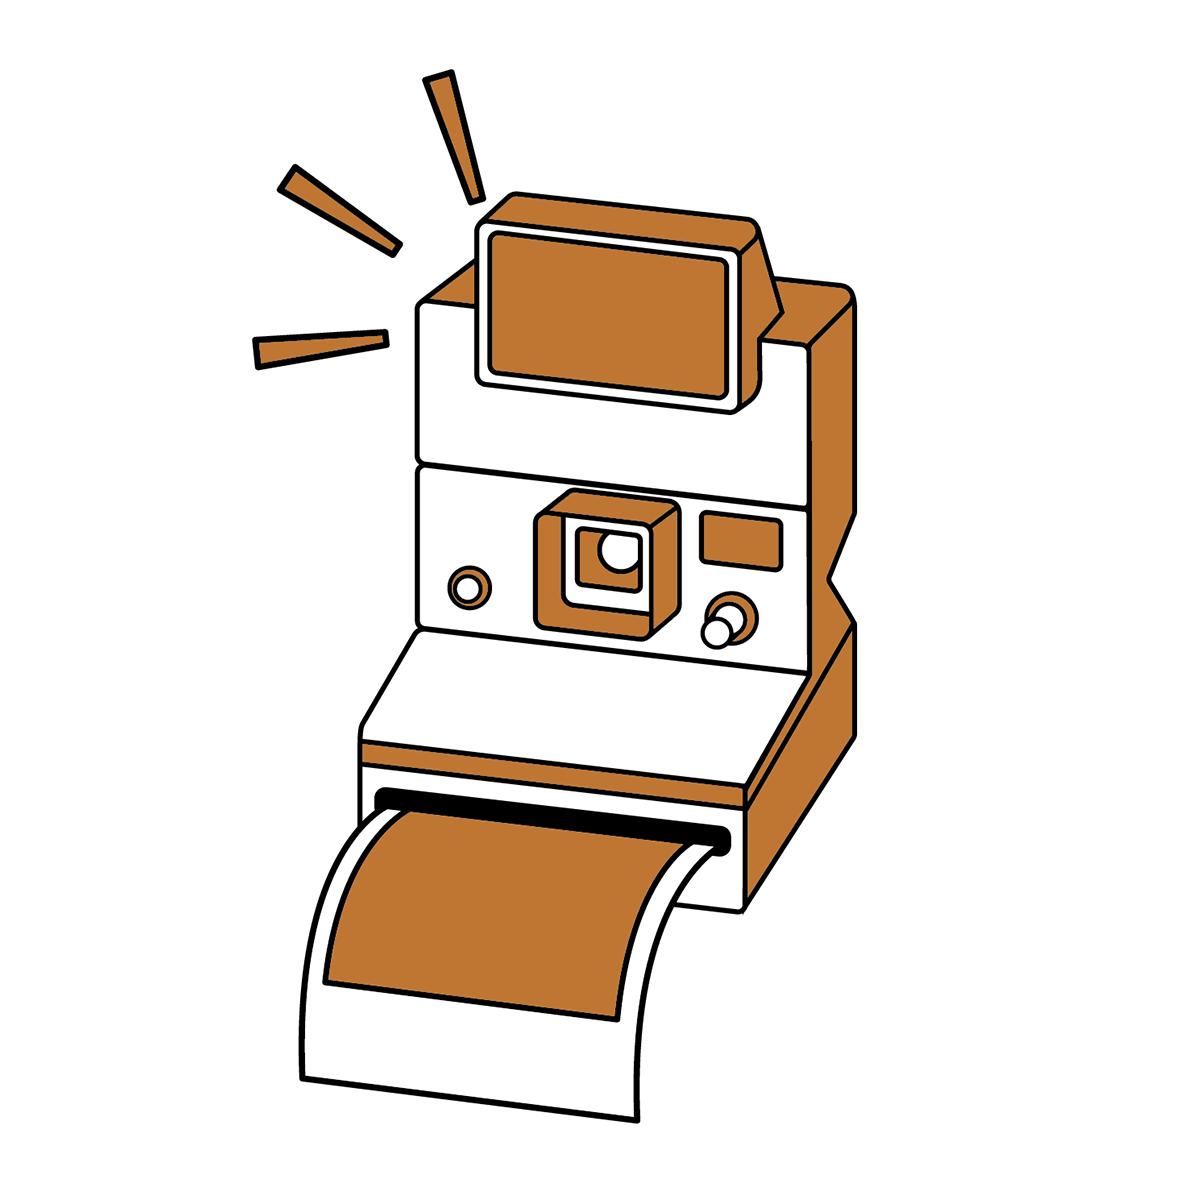 FUJ116068 - Miniexcavator